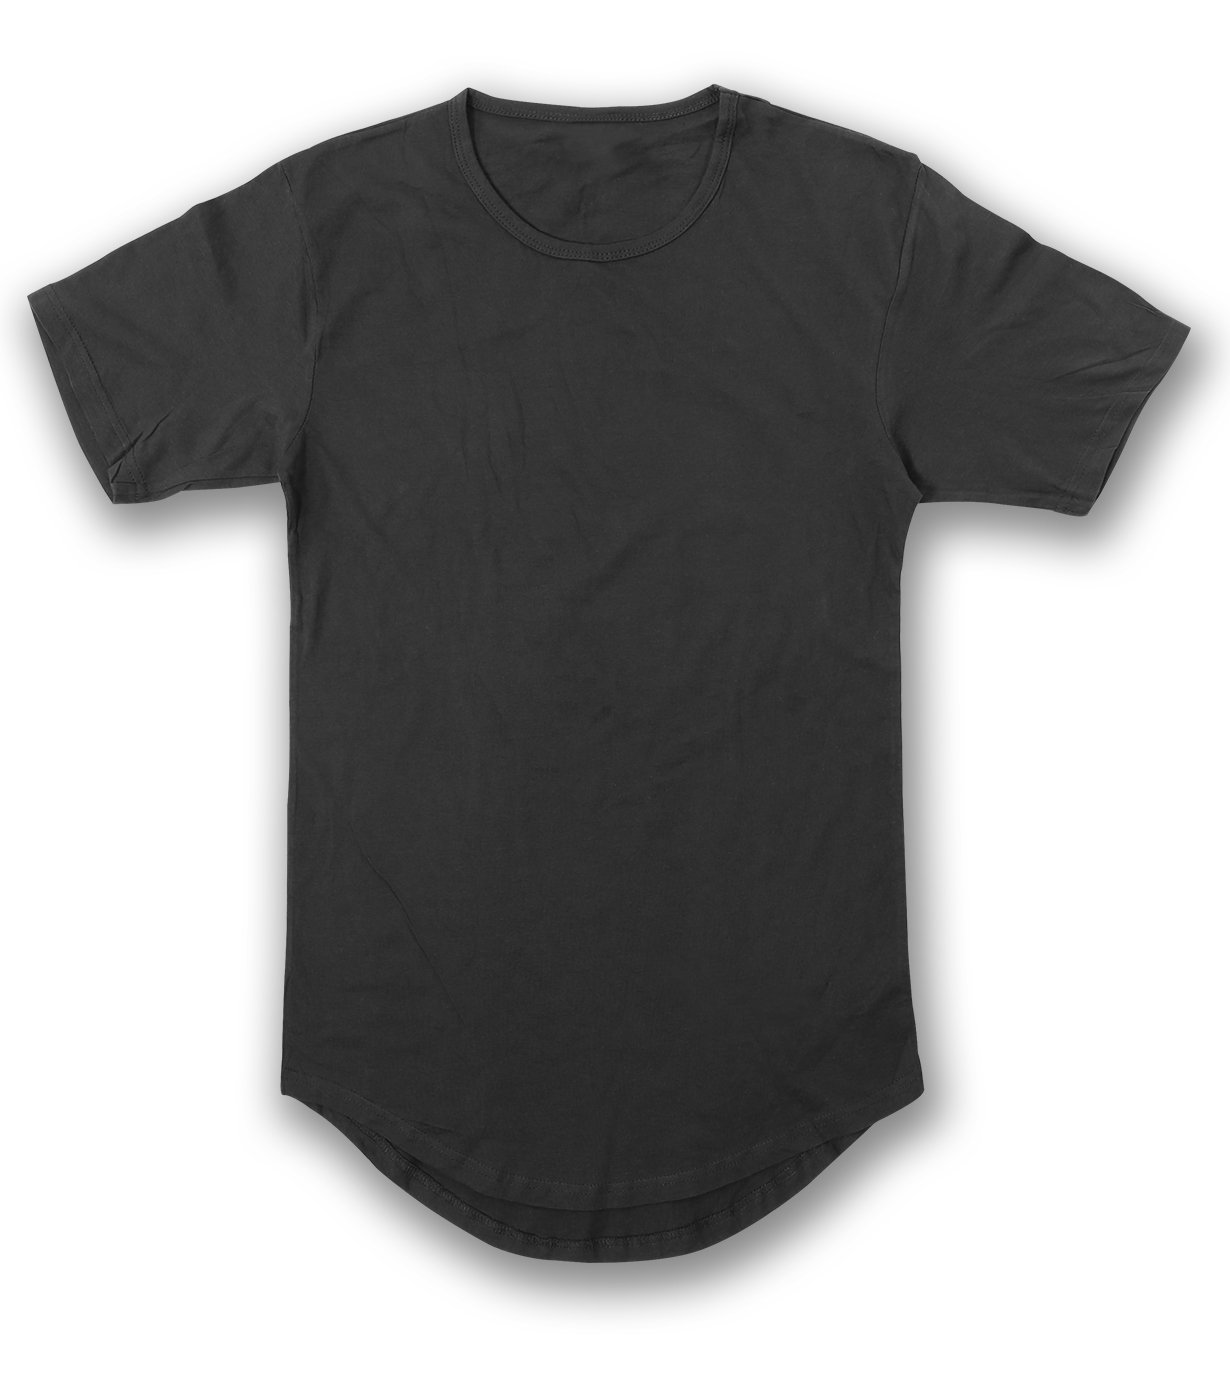 JD Apparel Men's Hipster Longline Drop Cut T-Shirts 2XL Black AM1050